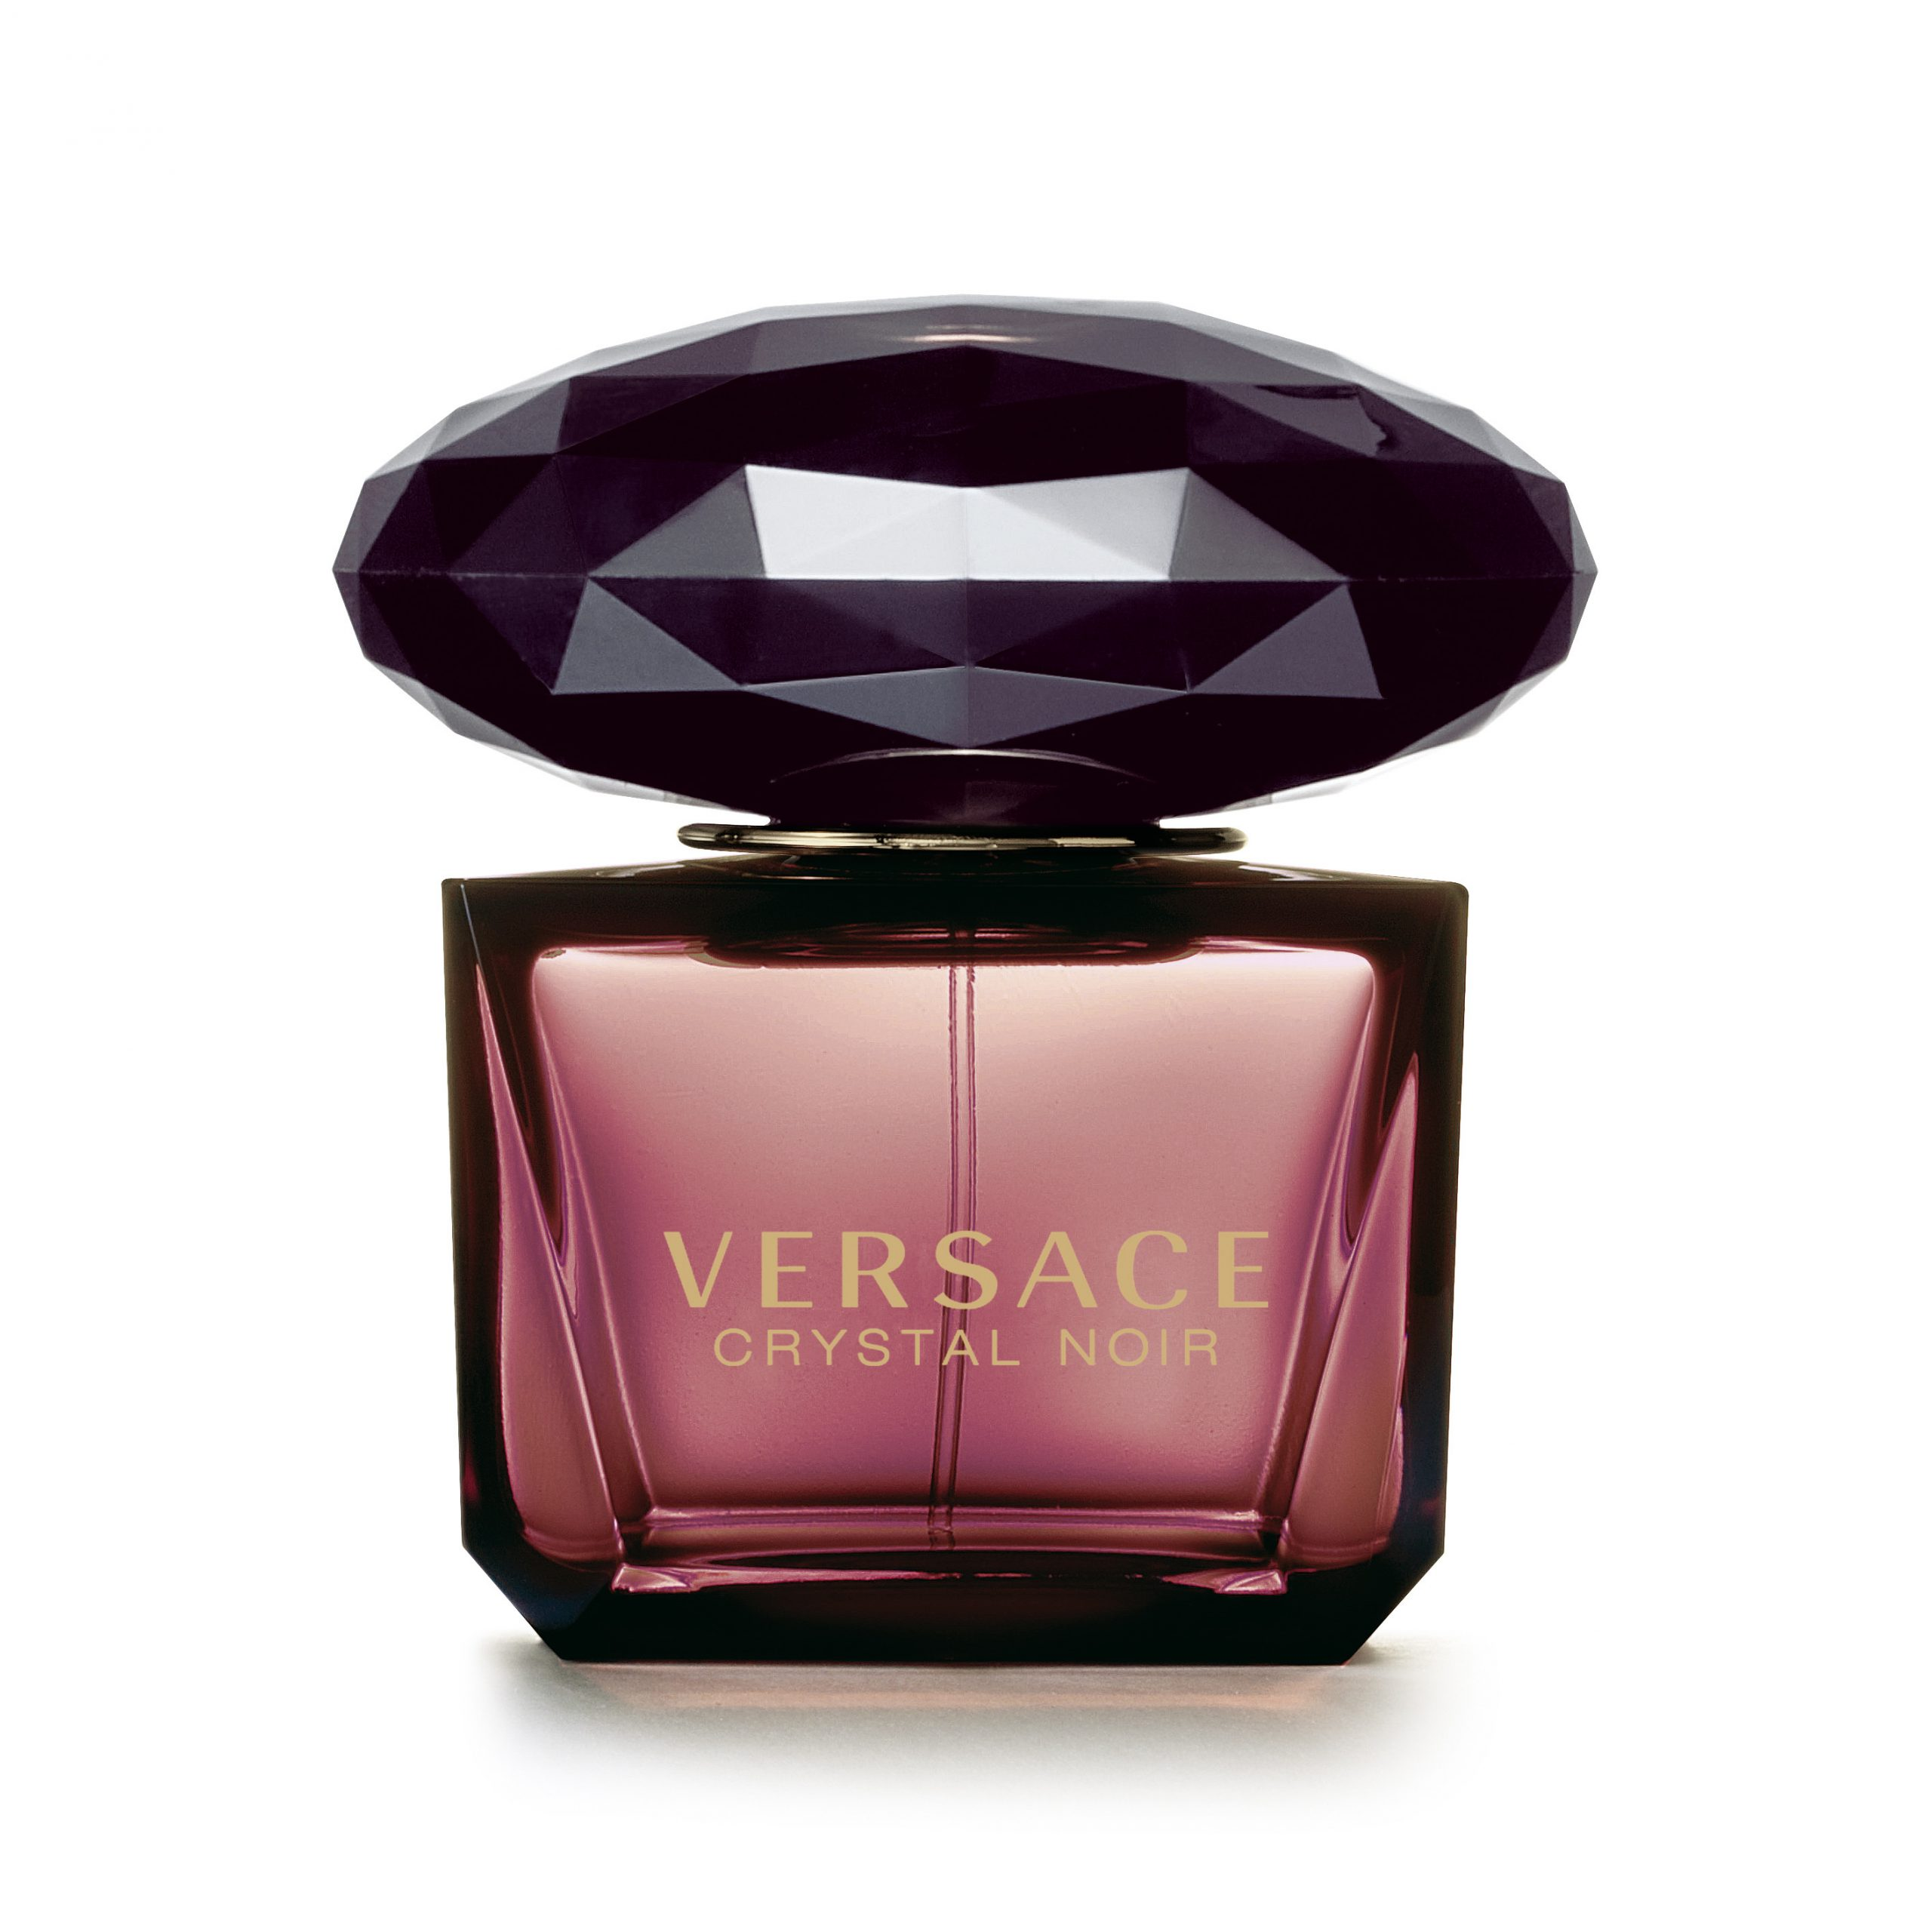 versace cr versace 8018365070462 parent scaled - تستر اماراتی ادو پرفیوم زنانه ورساچه مدل Crystal Noir حجم 90 میلی لیتر